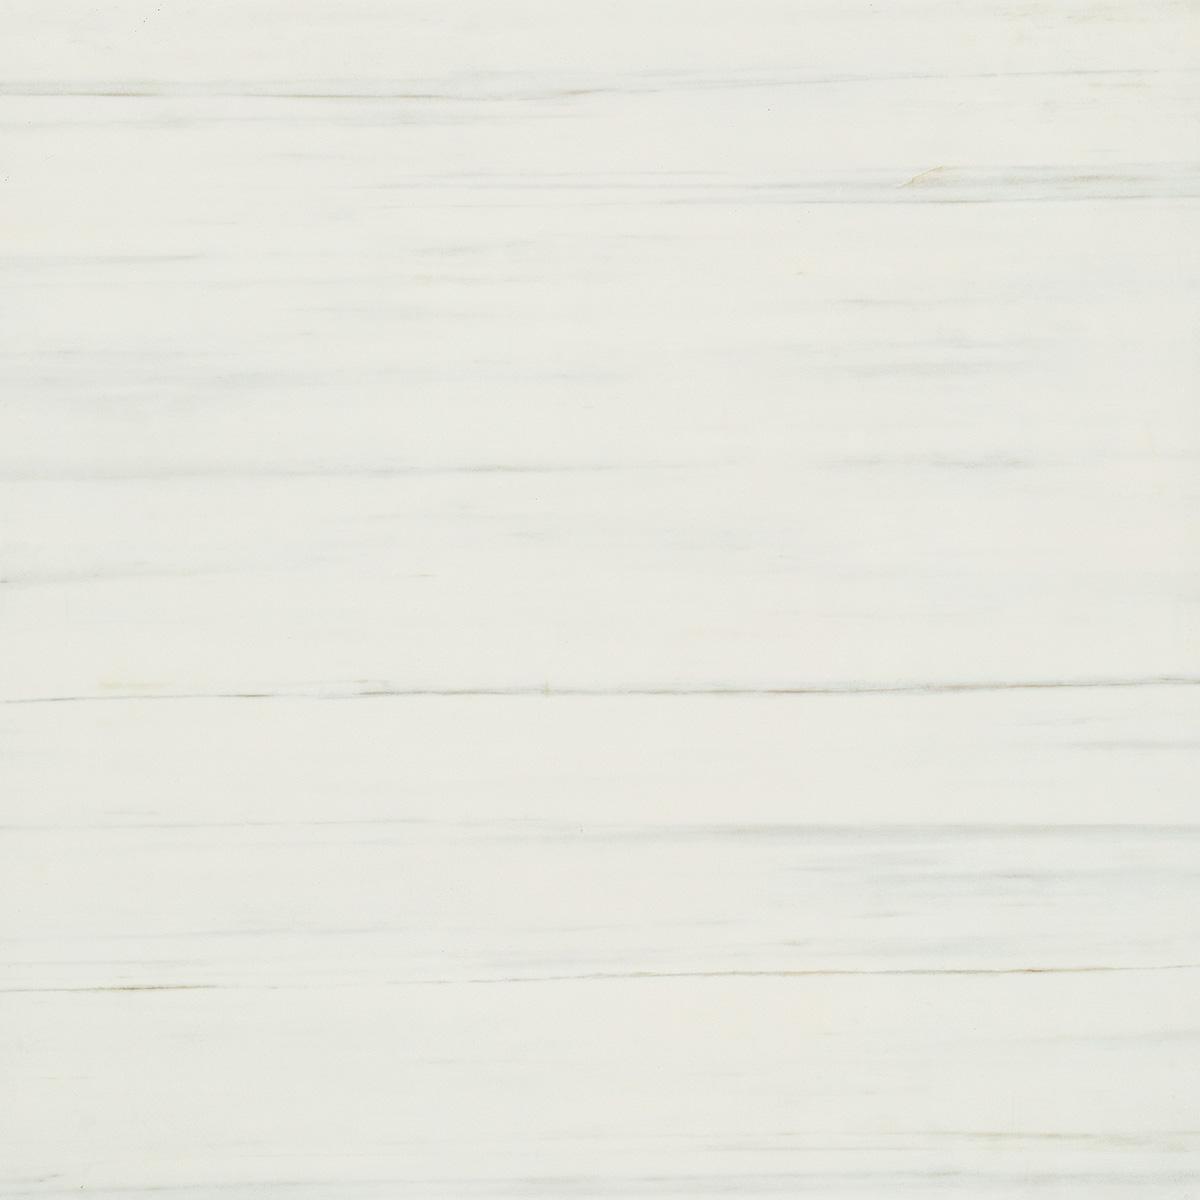 白雪公主HPAC280706(800x800mm)